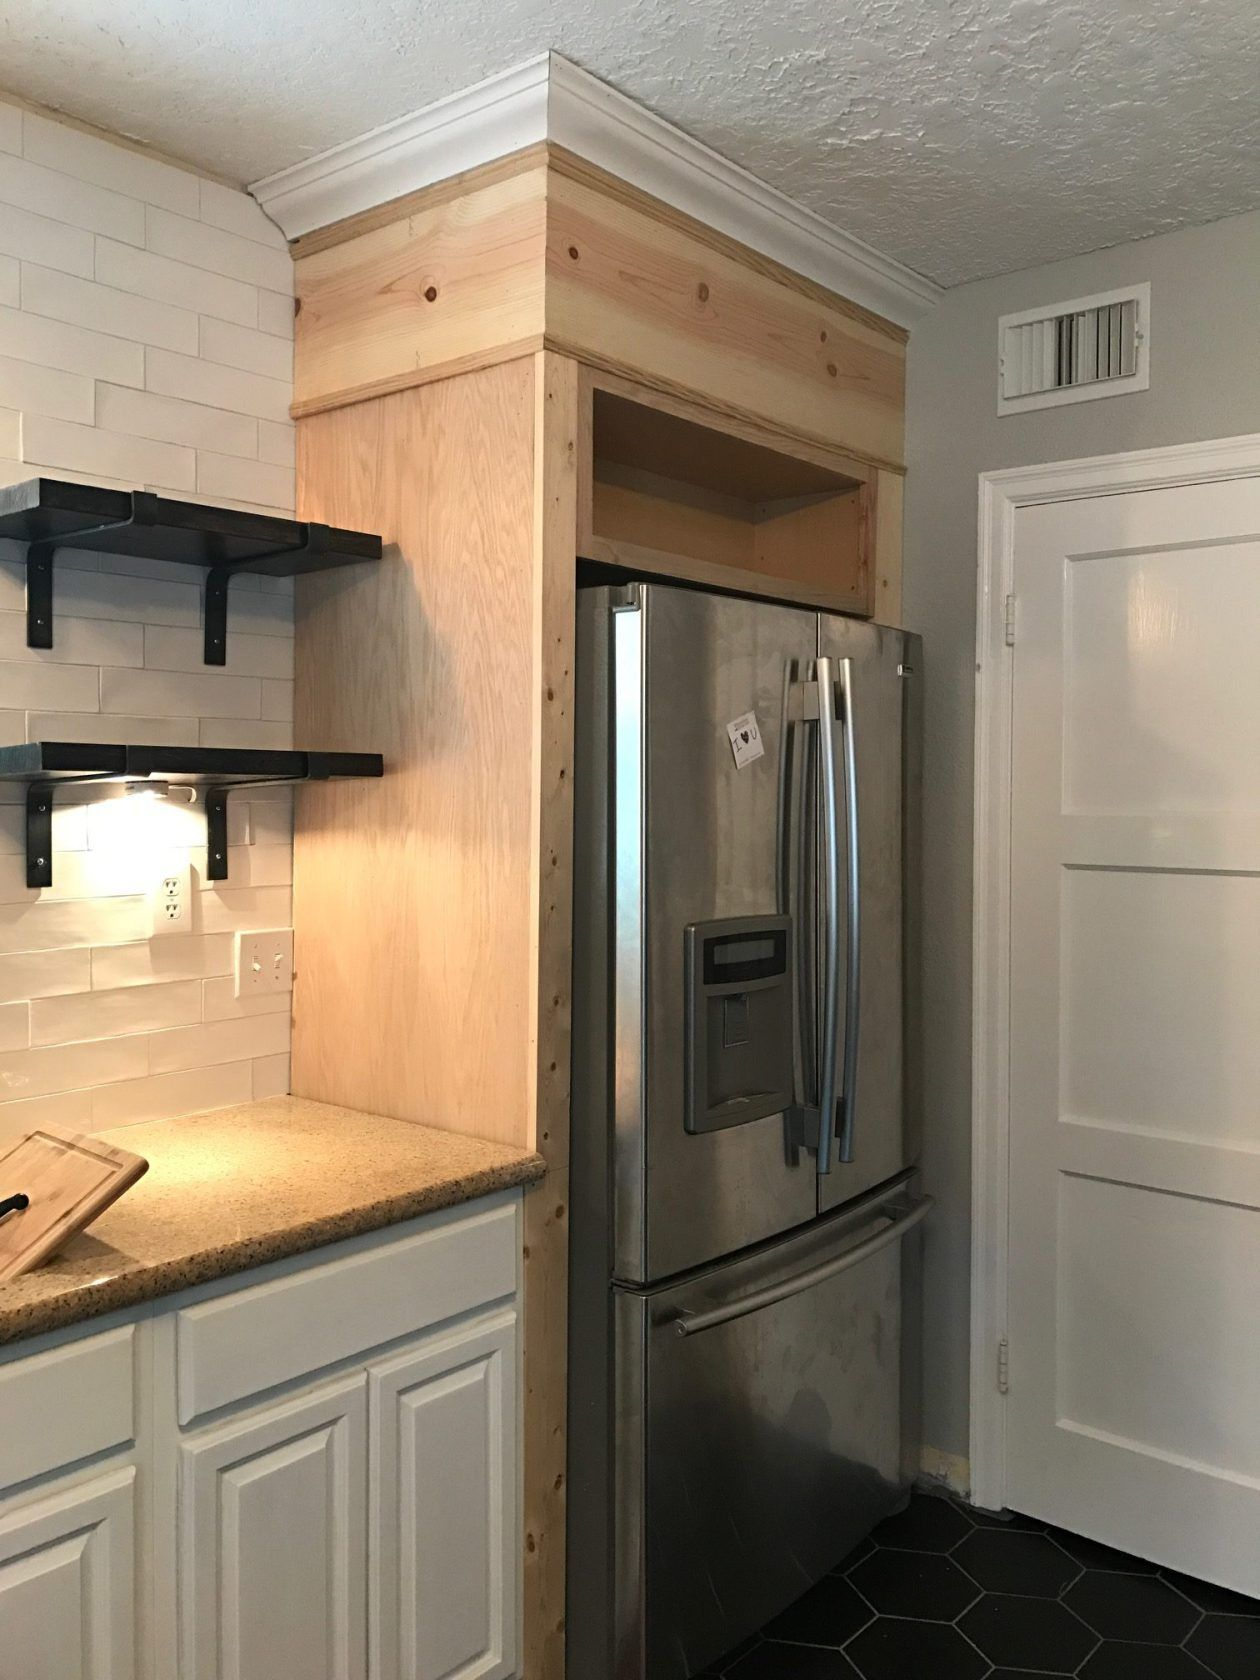 Diy Fridge Surround Kitchen Renovation Refrigerator Cabinet Custom Cabinet Over The Fridge Kitchen Diy Makeover Diy Kitchen Renovation Diy Kitchen Cabinets